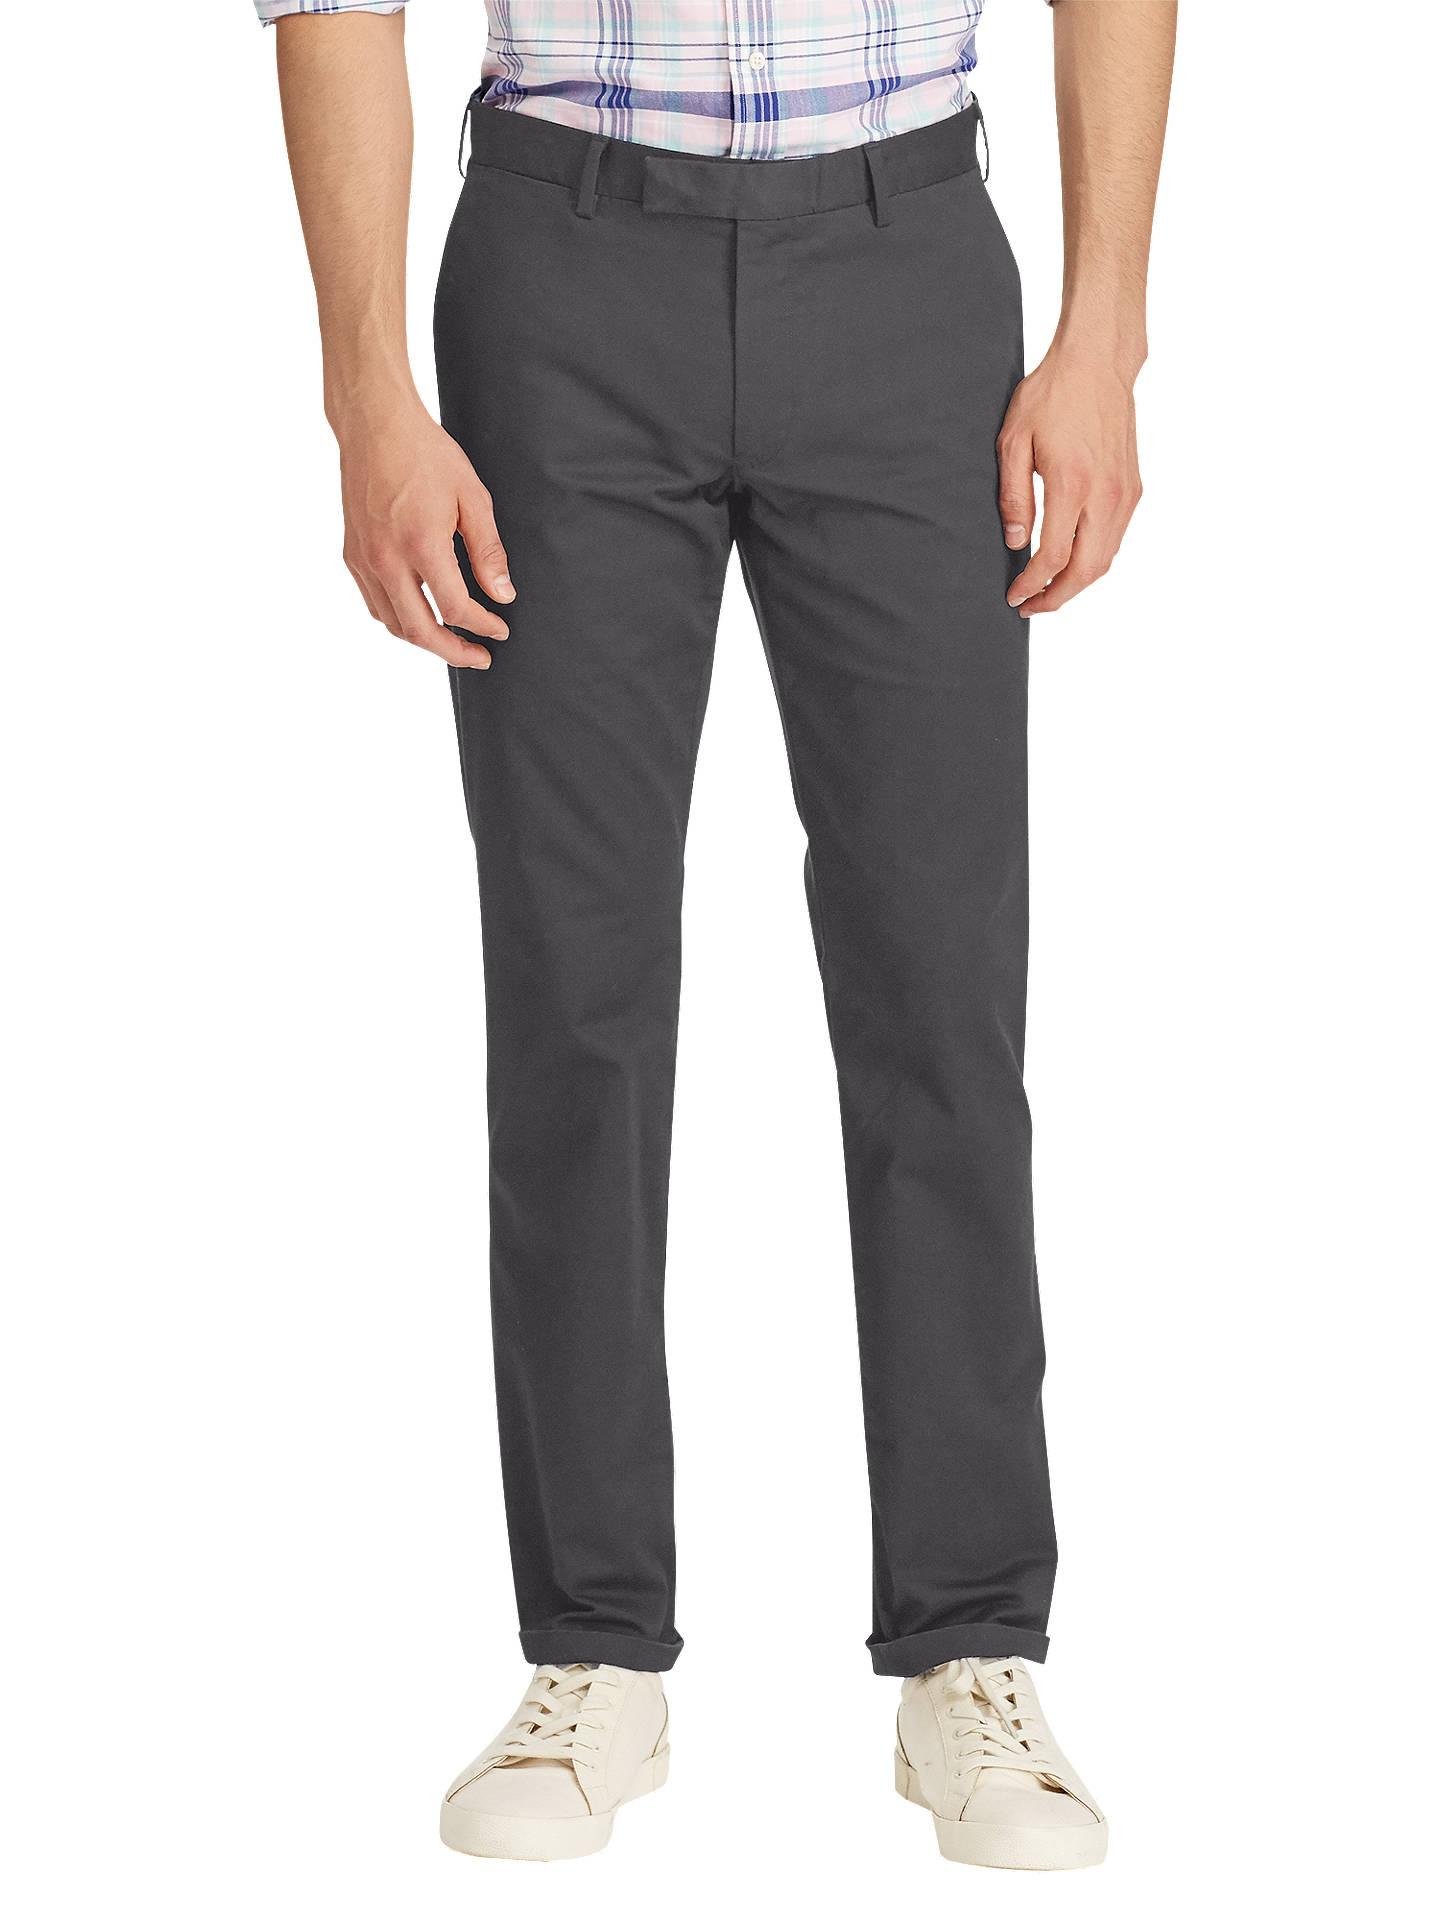 dc1f9c10 Polo Ralph Lauren Hudson Slim Fit Stretch Cotton Trousers at John ...